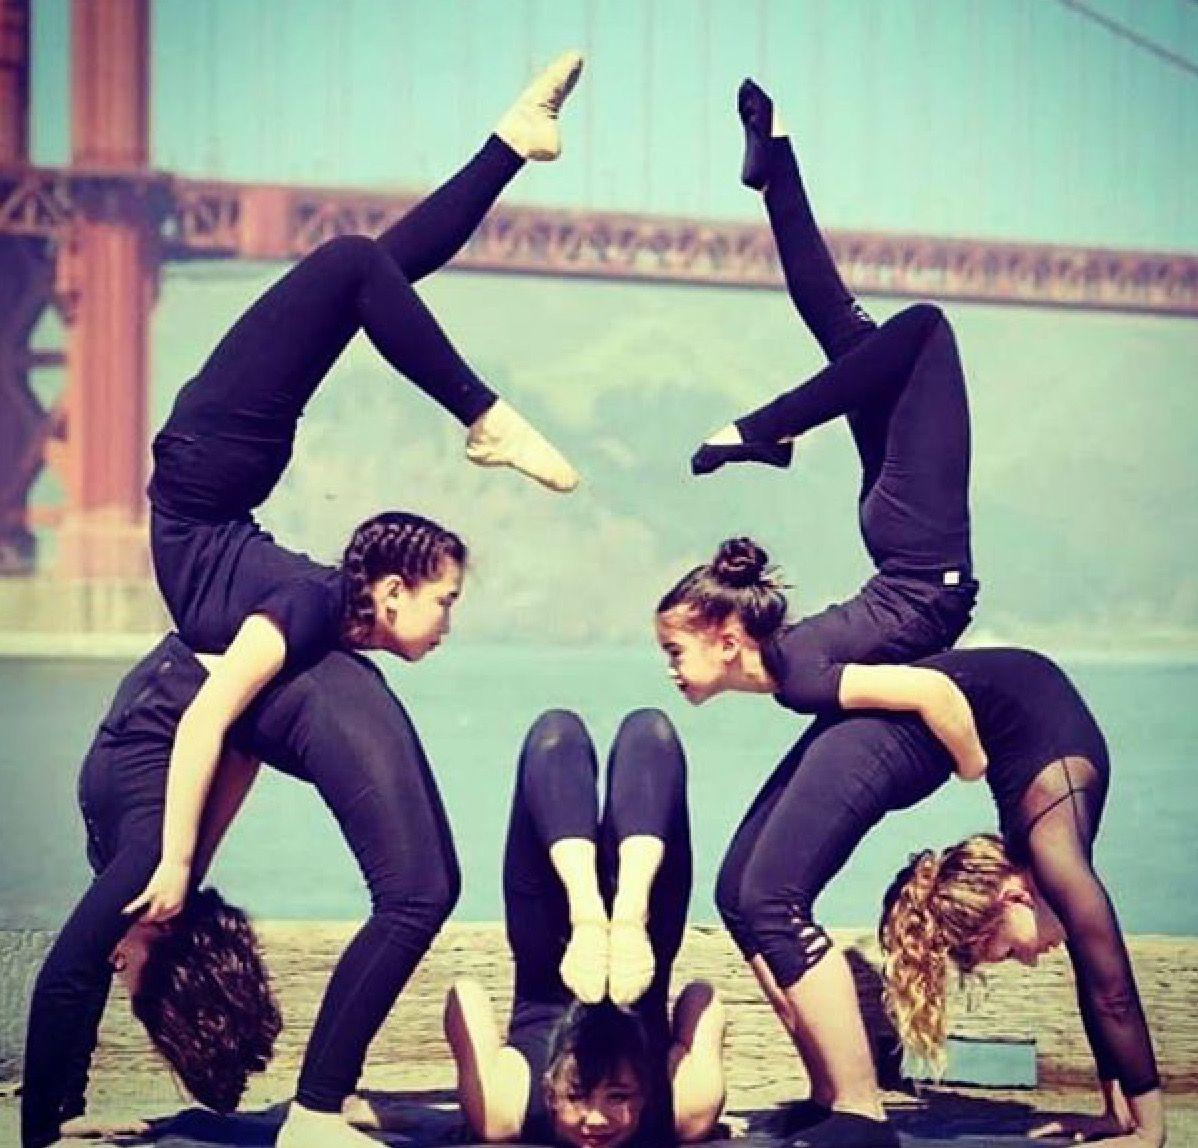 Pin By Rocio On Dance Acro Yoga Gymnastics Poses Acro Gymnastics